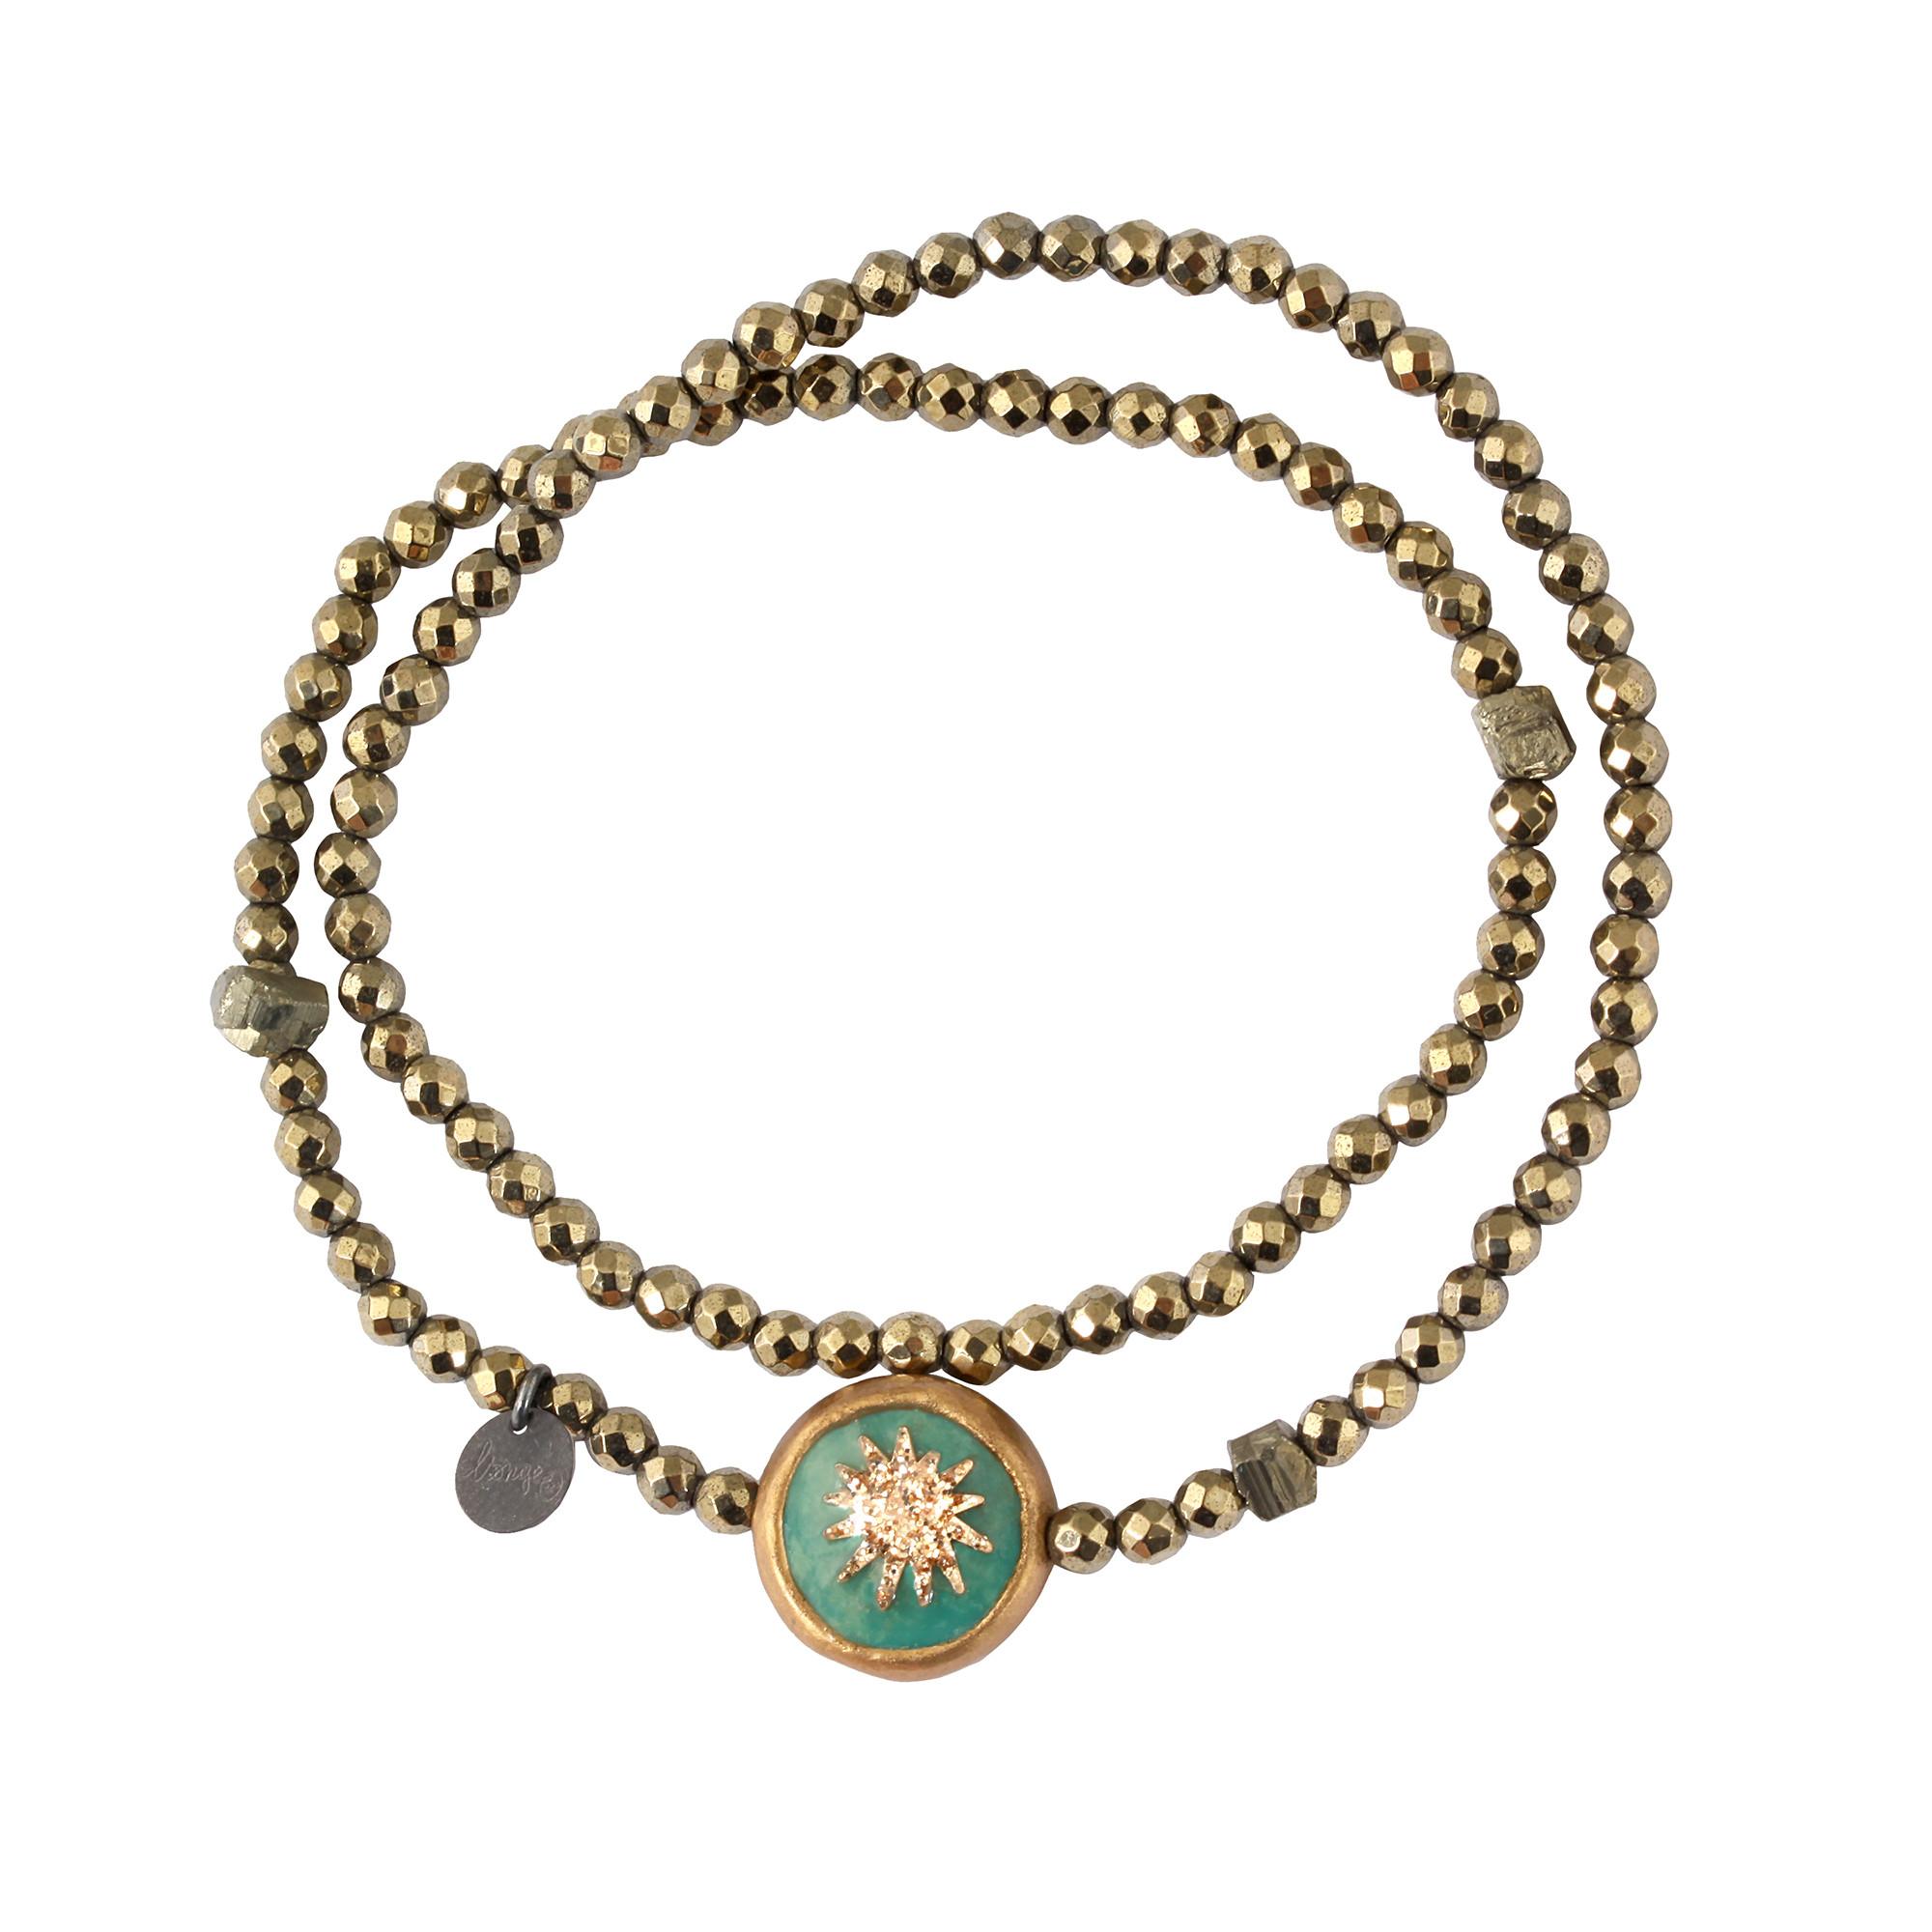 LSONGE - Bracelet Soleil Double Hématite Kaki 1 Turquoise